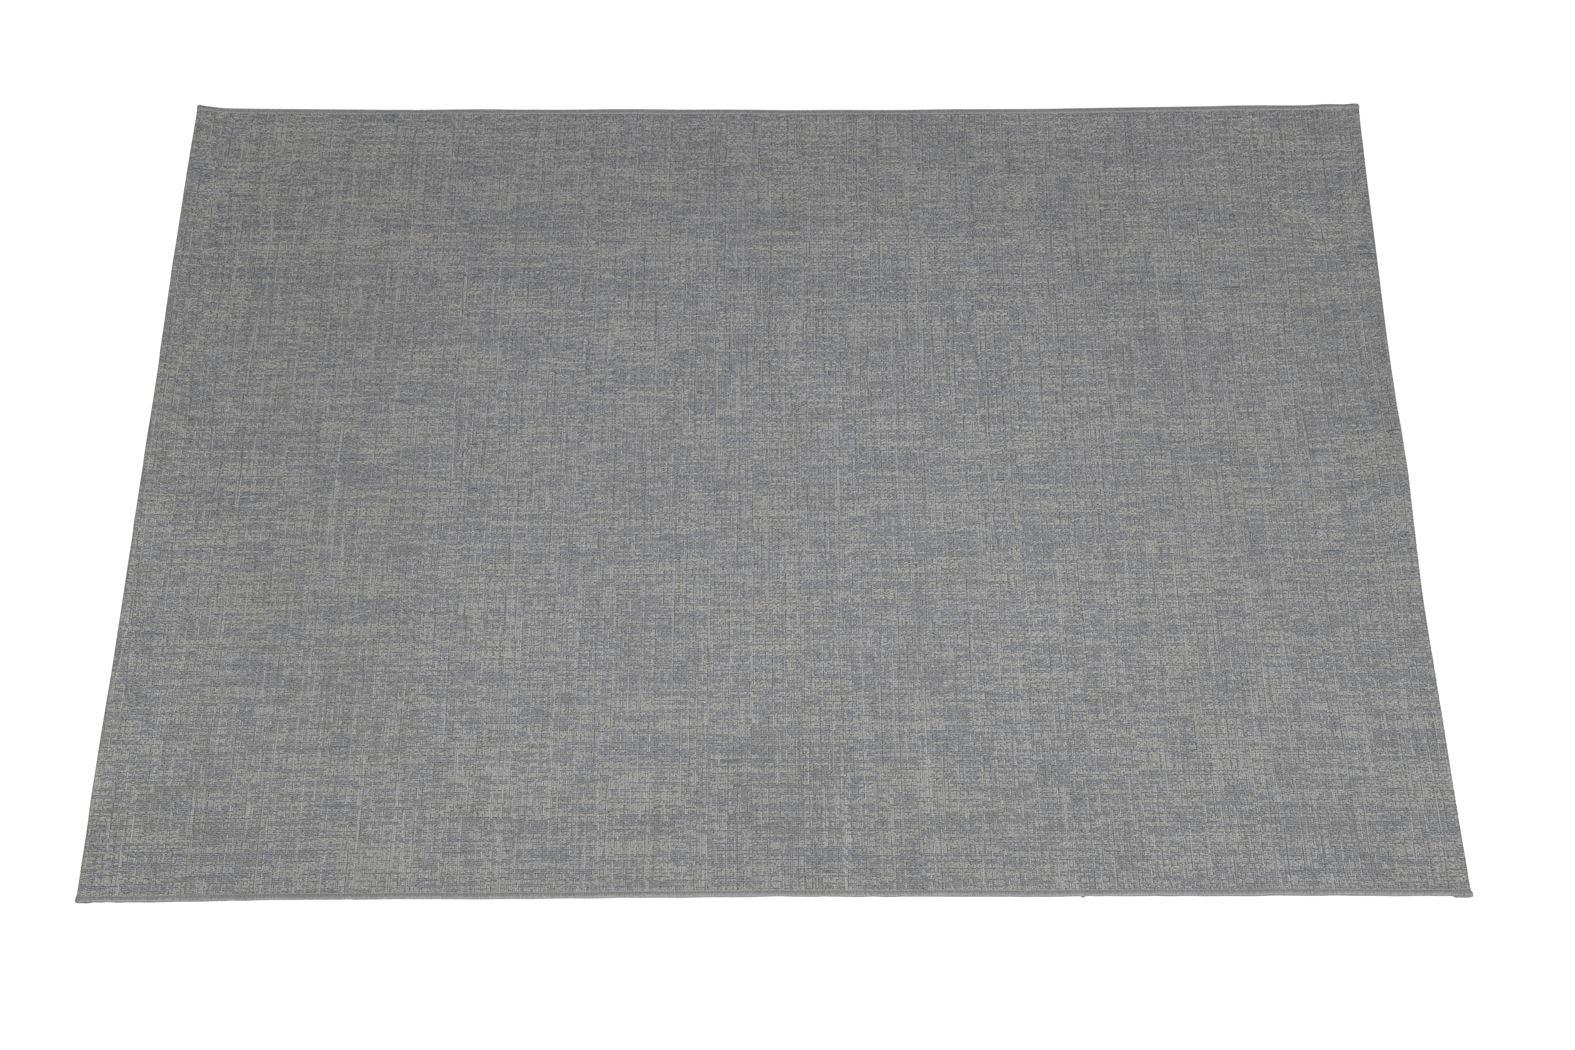 garden impressions warenza karpet grijs